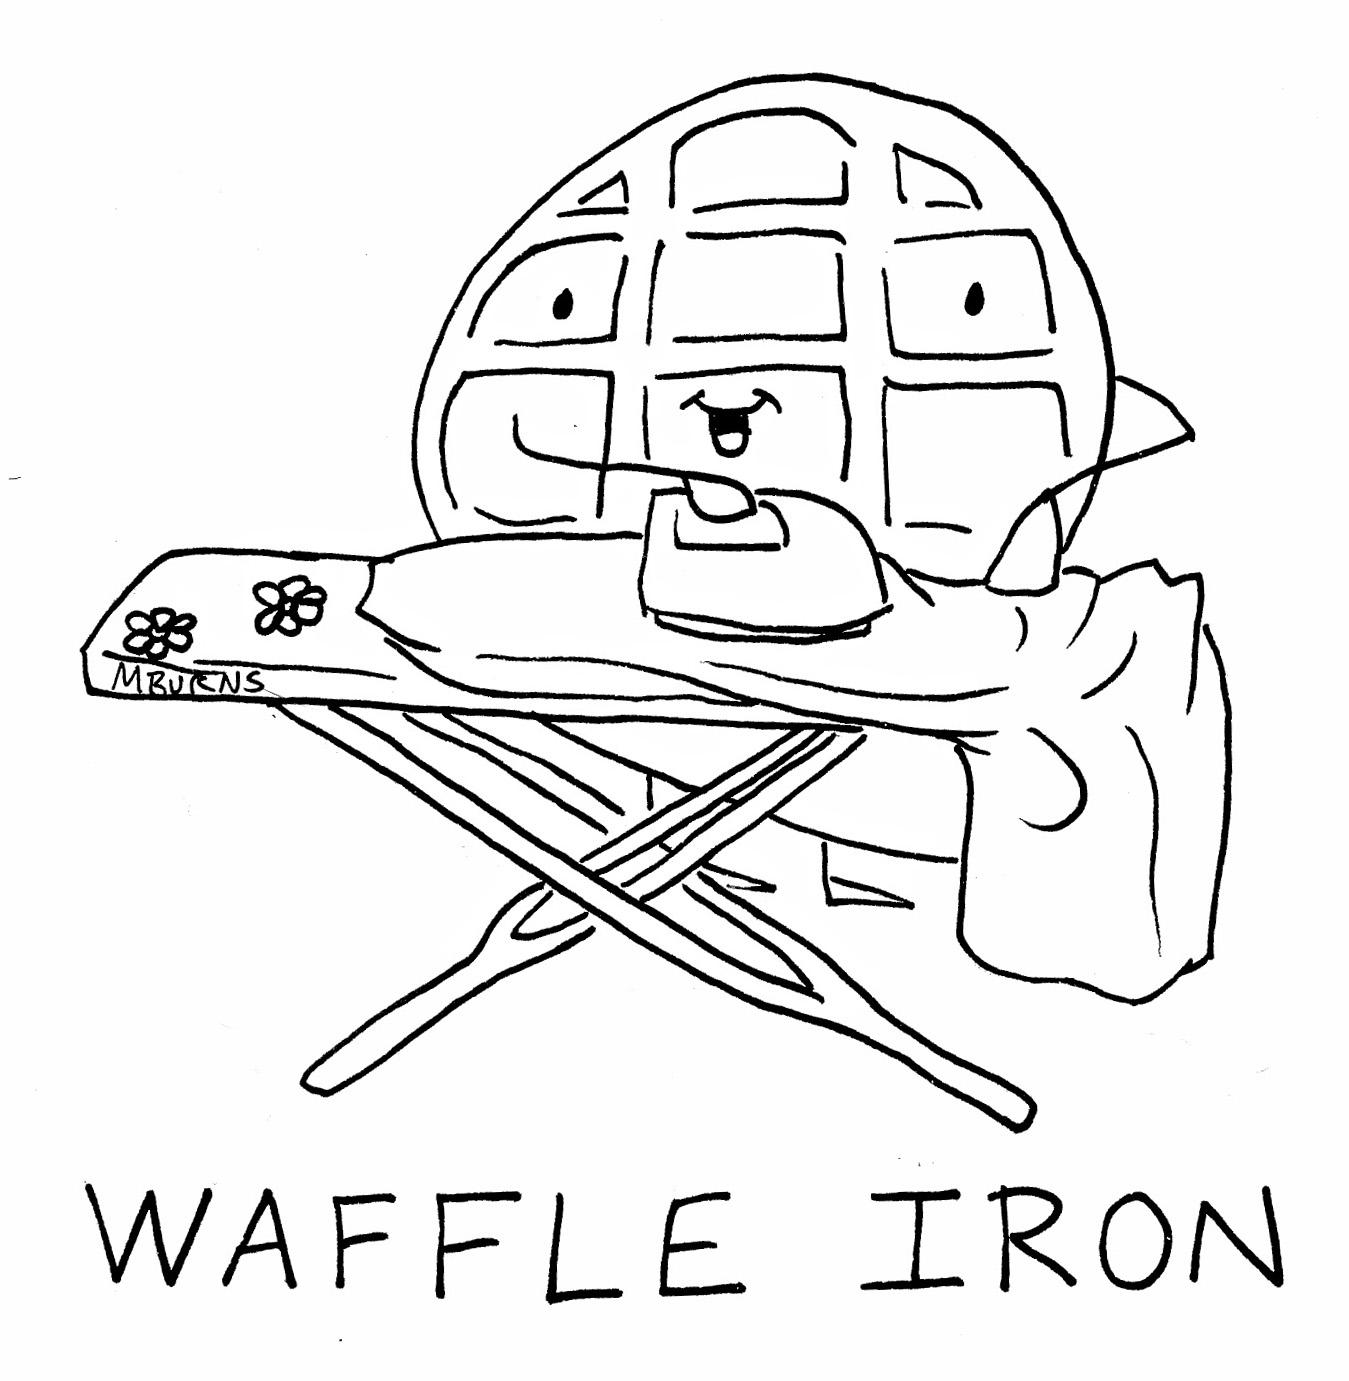 Comic Strip By Mike Burns Nutcracker Catacomb Waffle